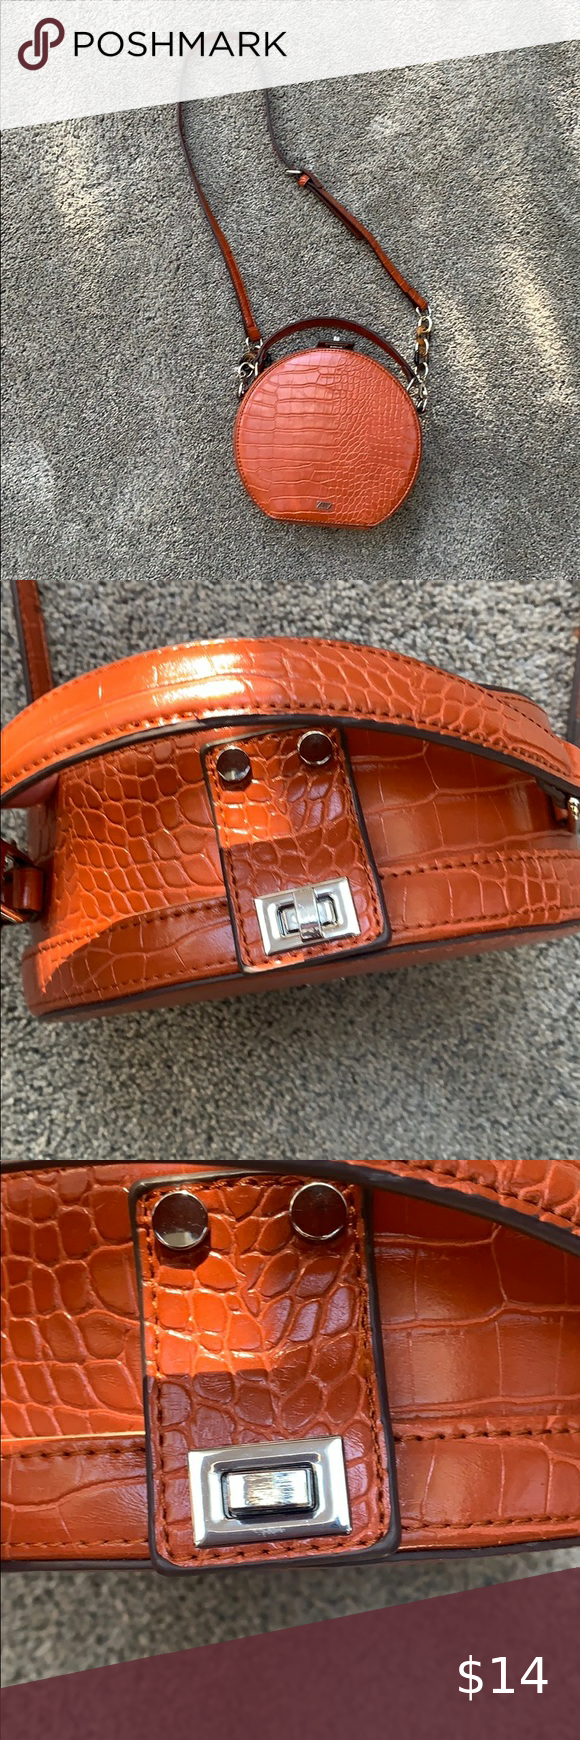 🍂CUTE bag, adjustable strap, nwot 🍂CUTE bag, adjus